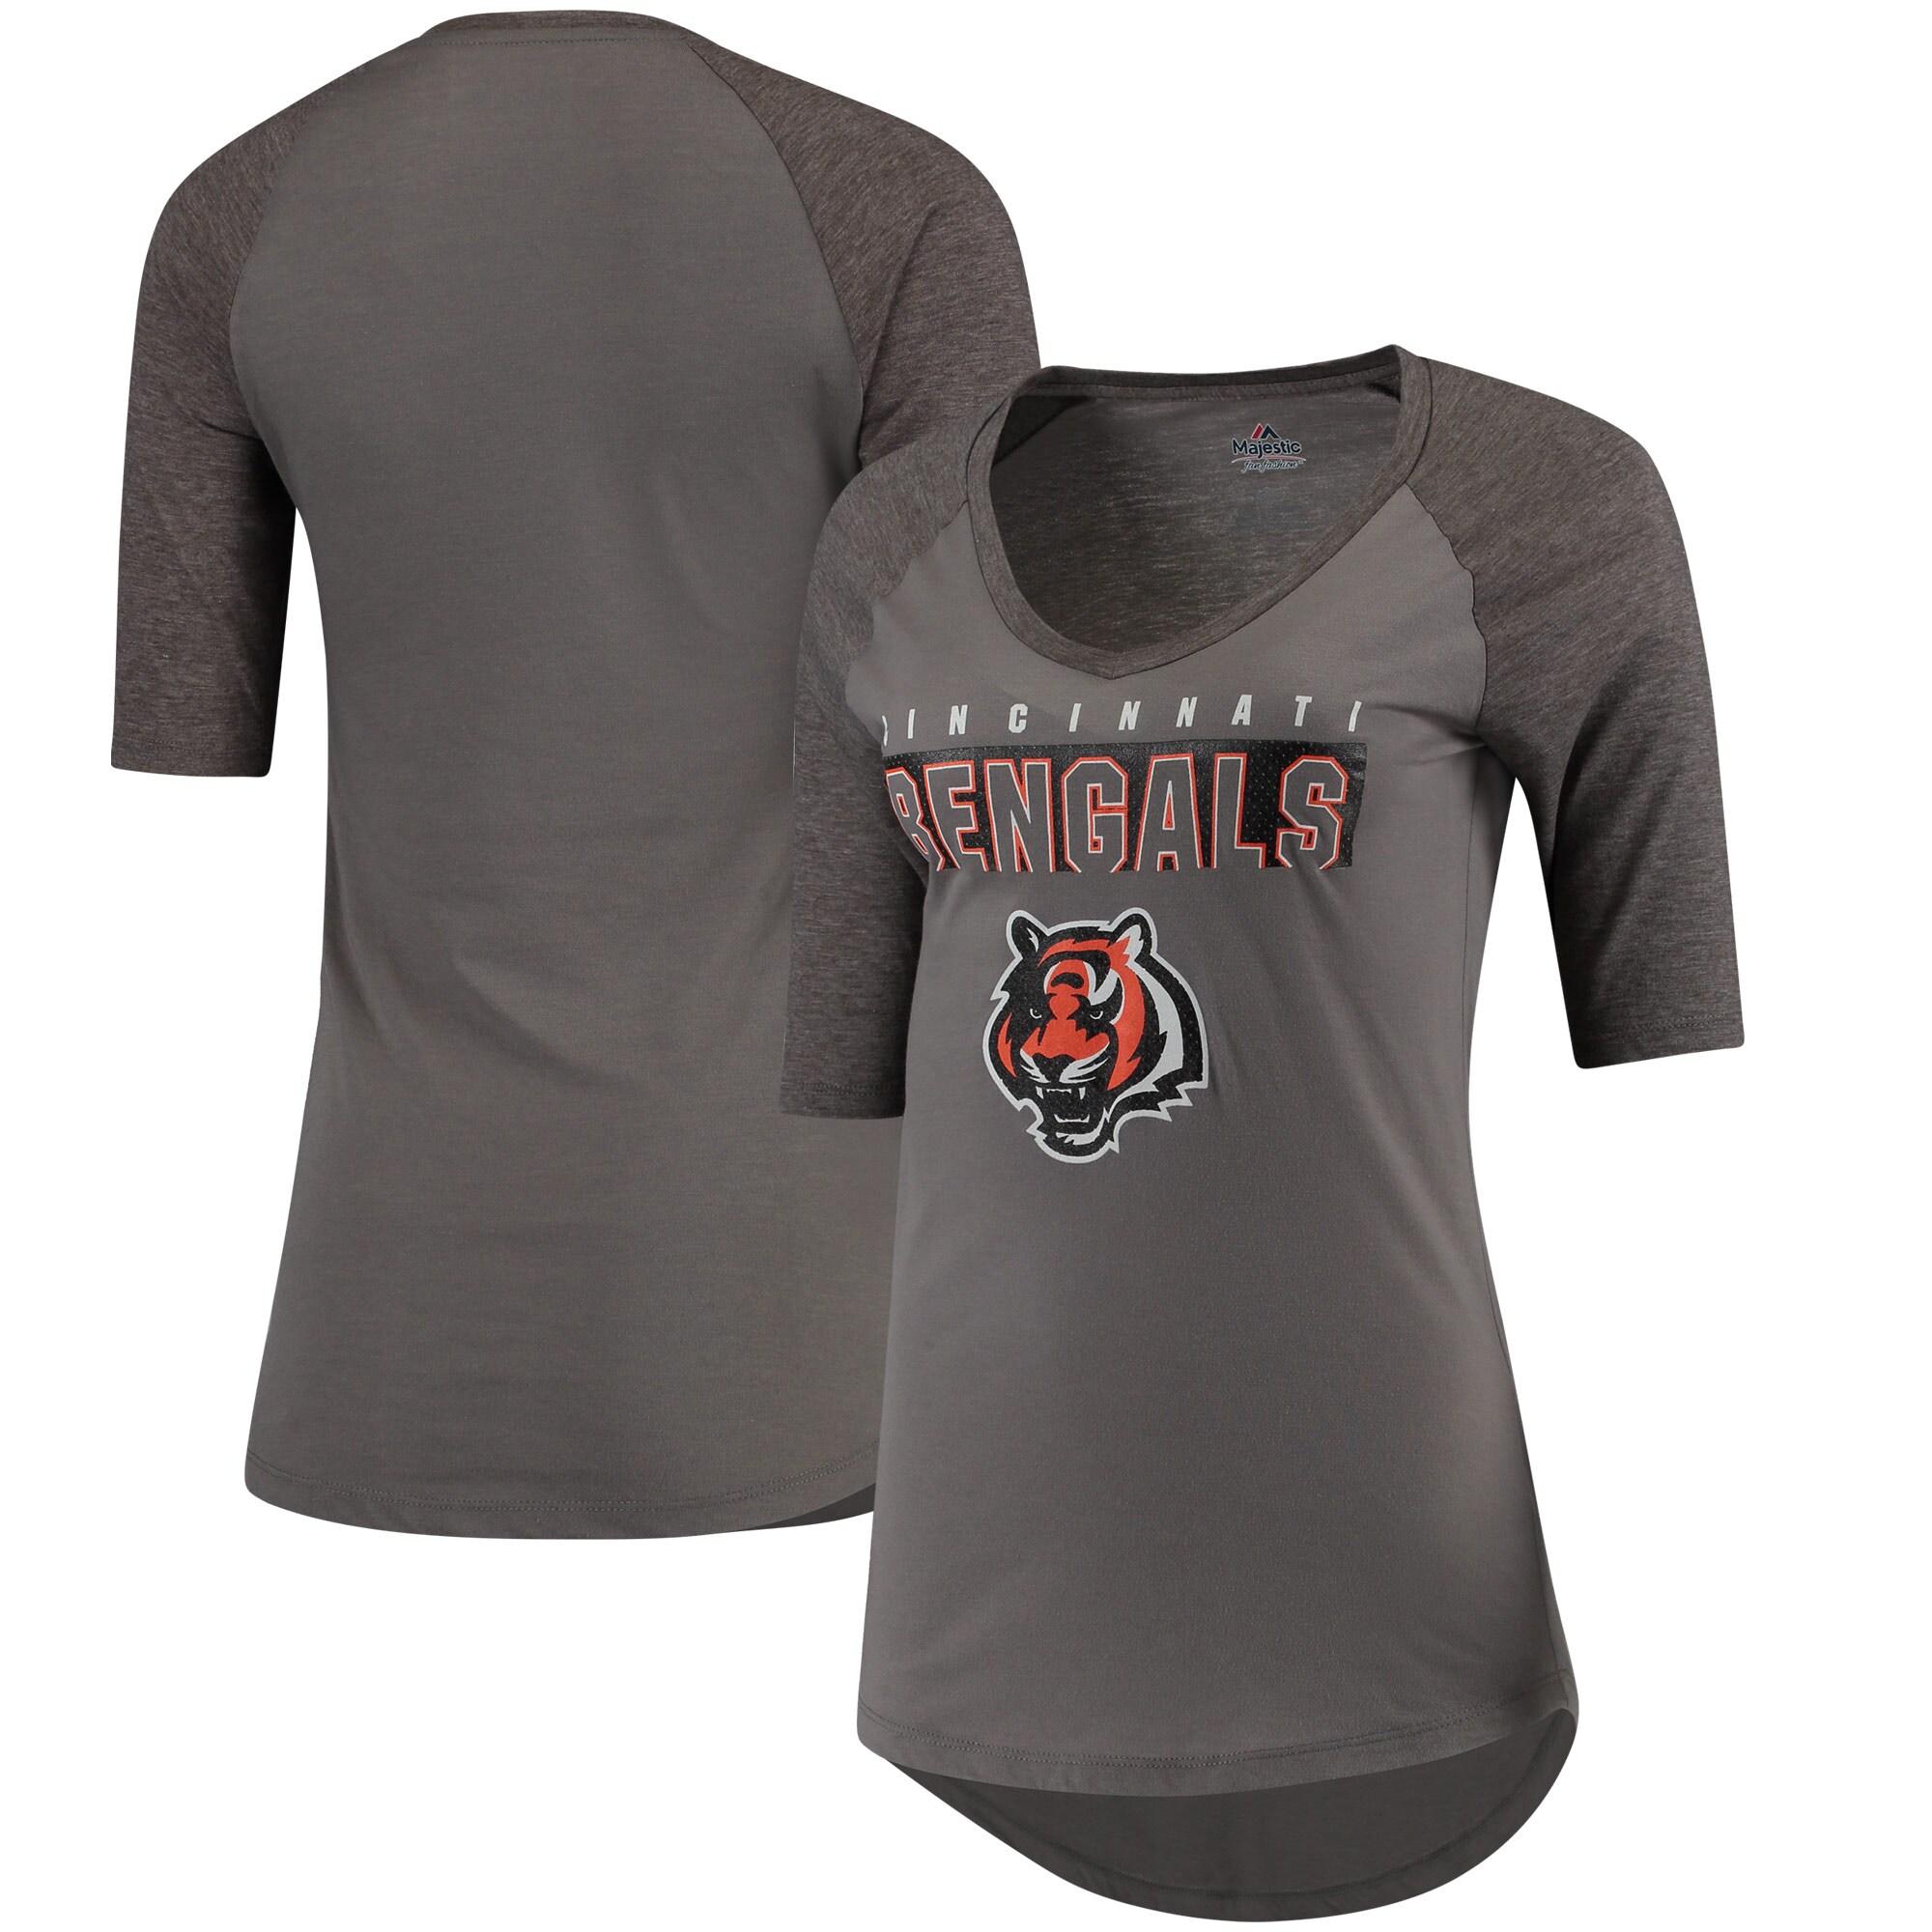 Cincinnati Bengals Majestic Women's My Team Raglan Half-Sleeve T-Shirt - Charcoal/Heathered Gray